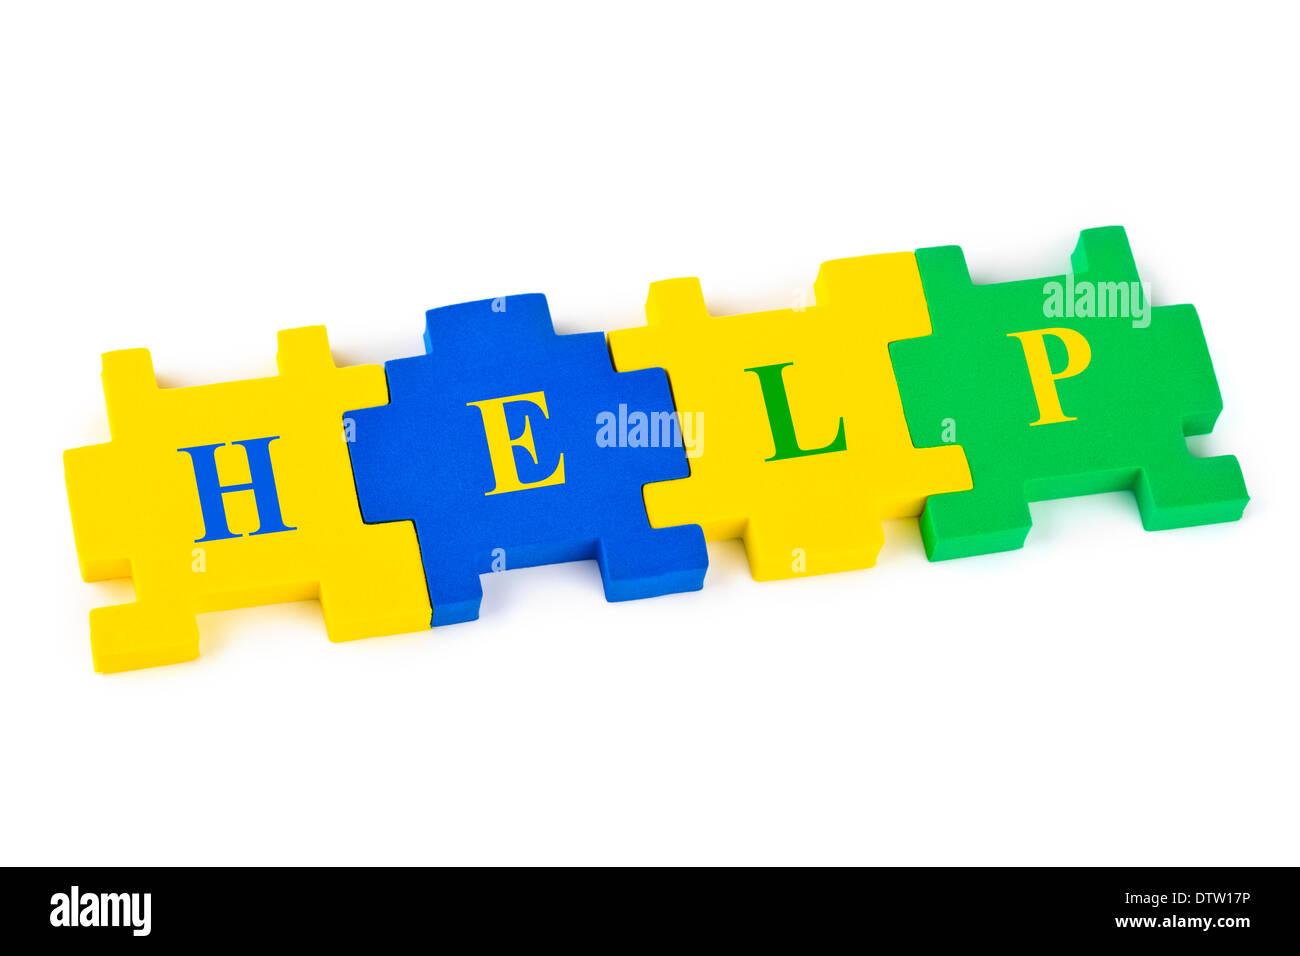 Puzzle Help Stock Photo, Royalty Free Image: 66932650 - Alamy